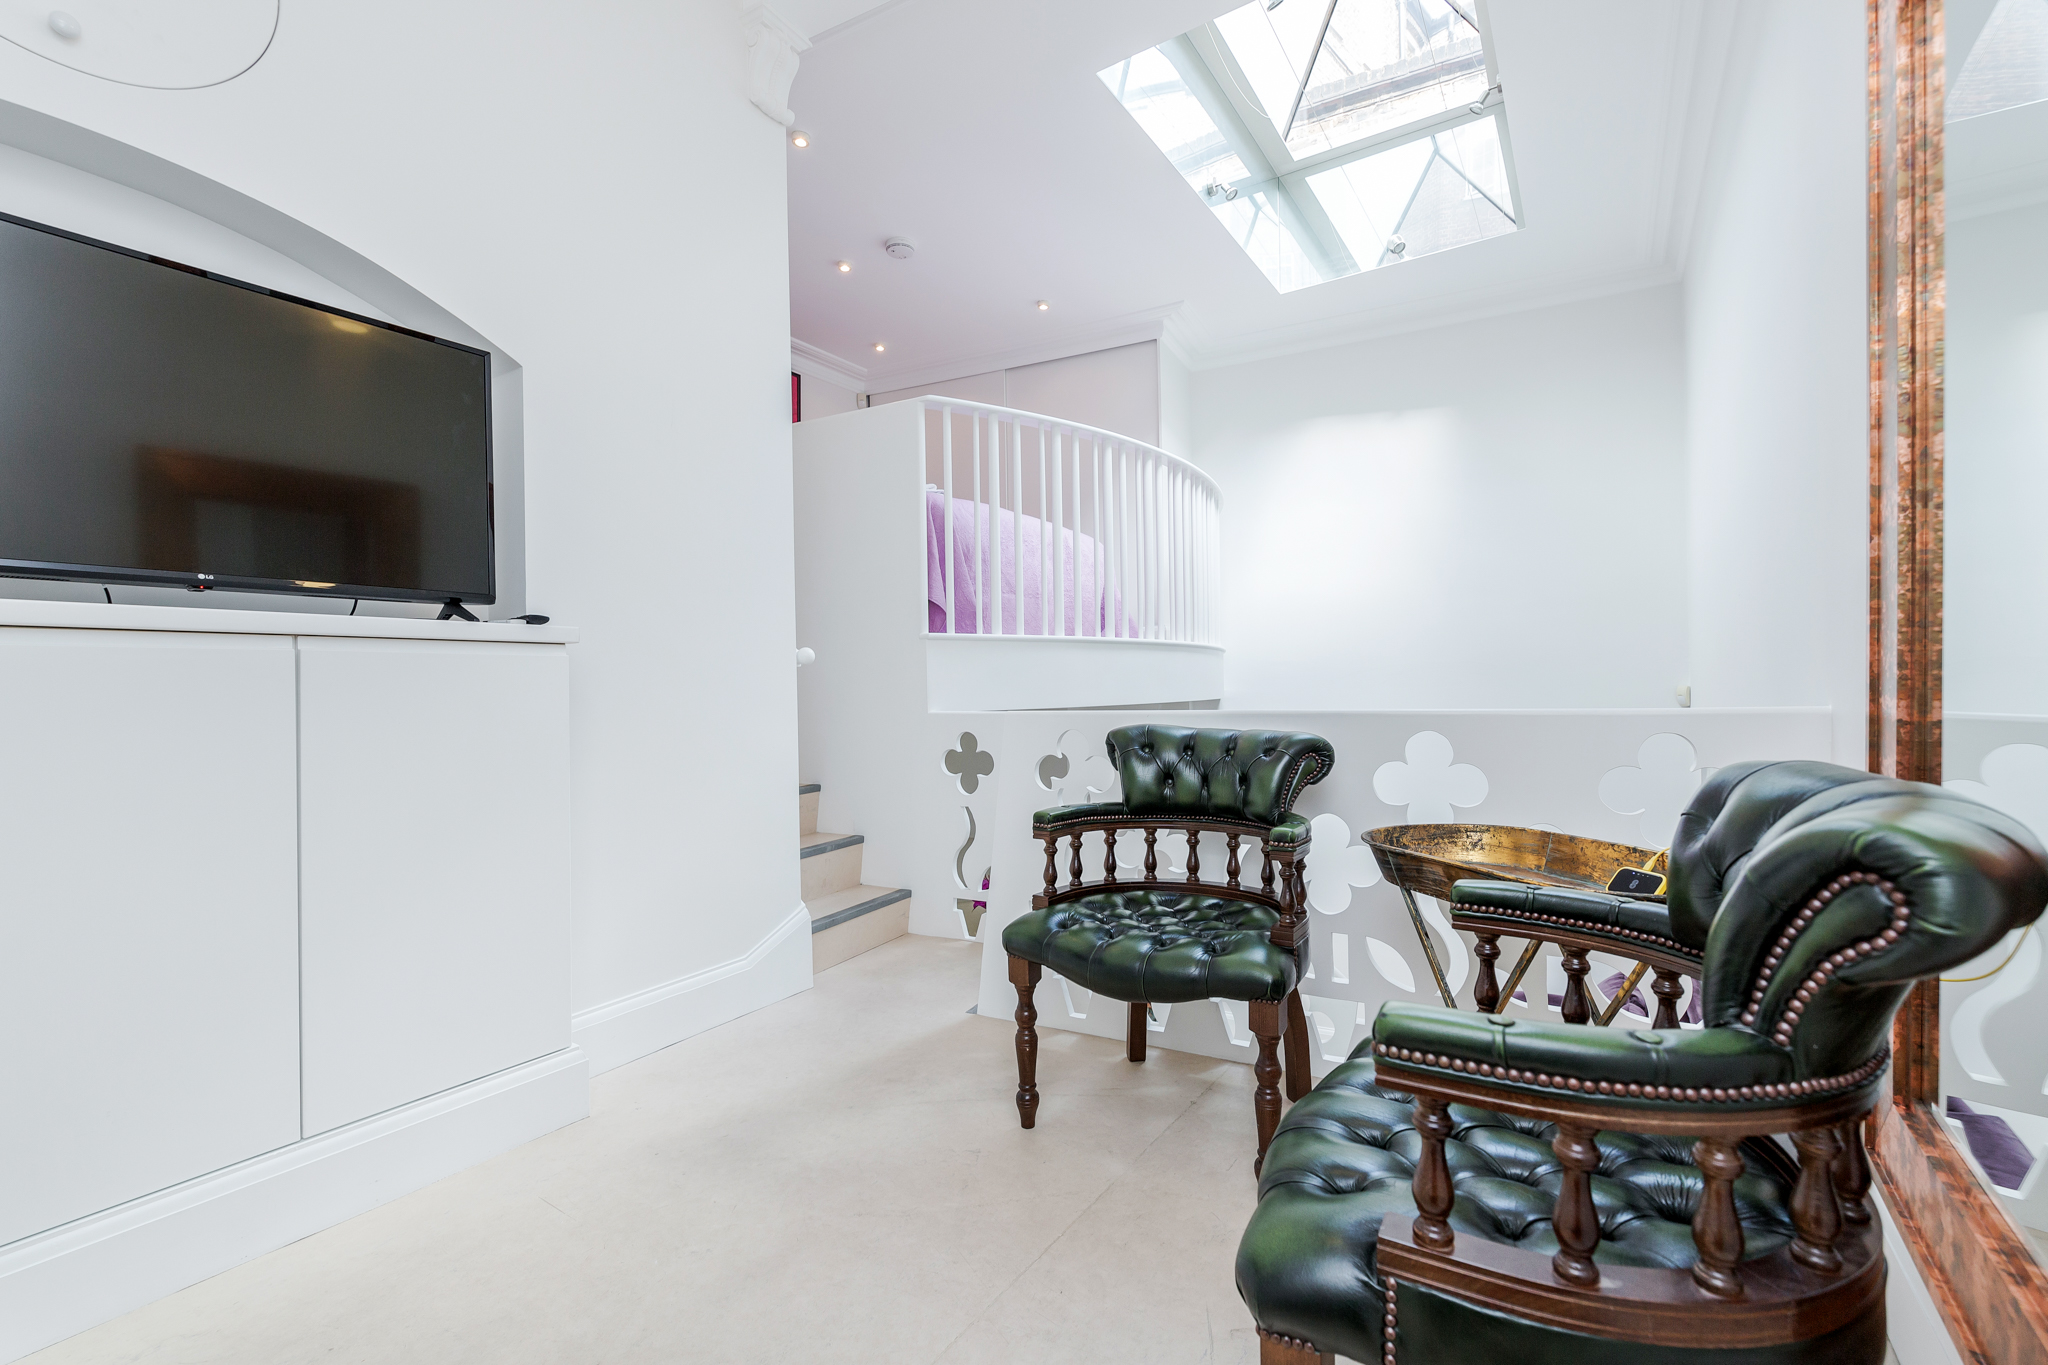 Apartment Distinctive Kensington apt for 3 with Mezzanine photo 23290249